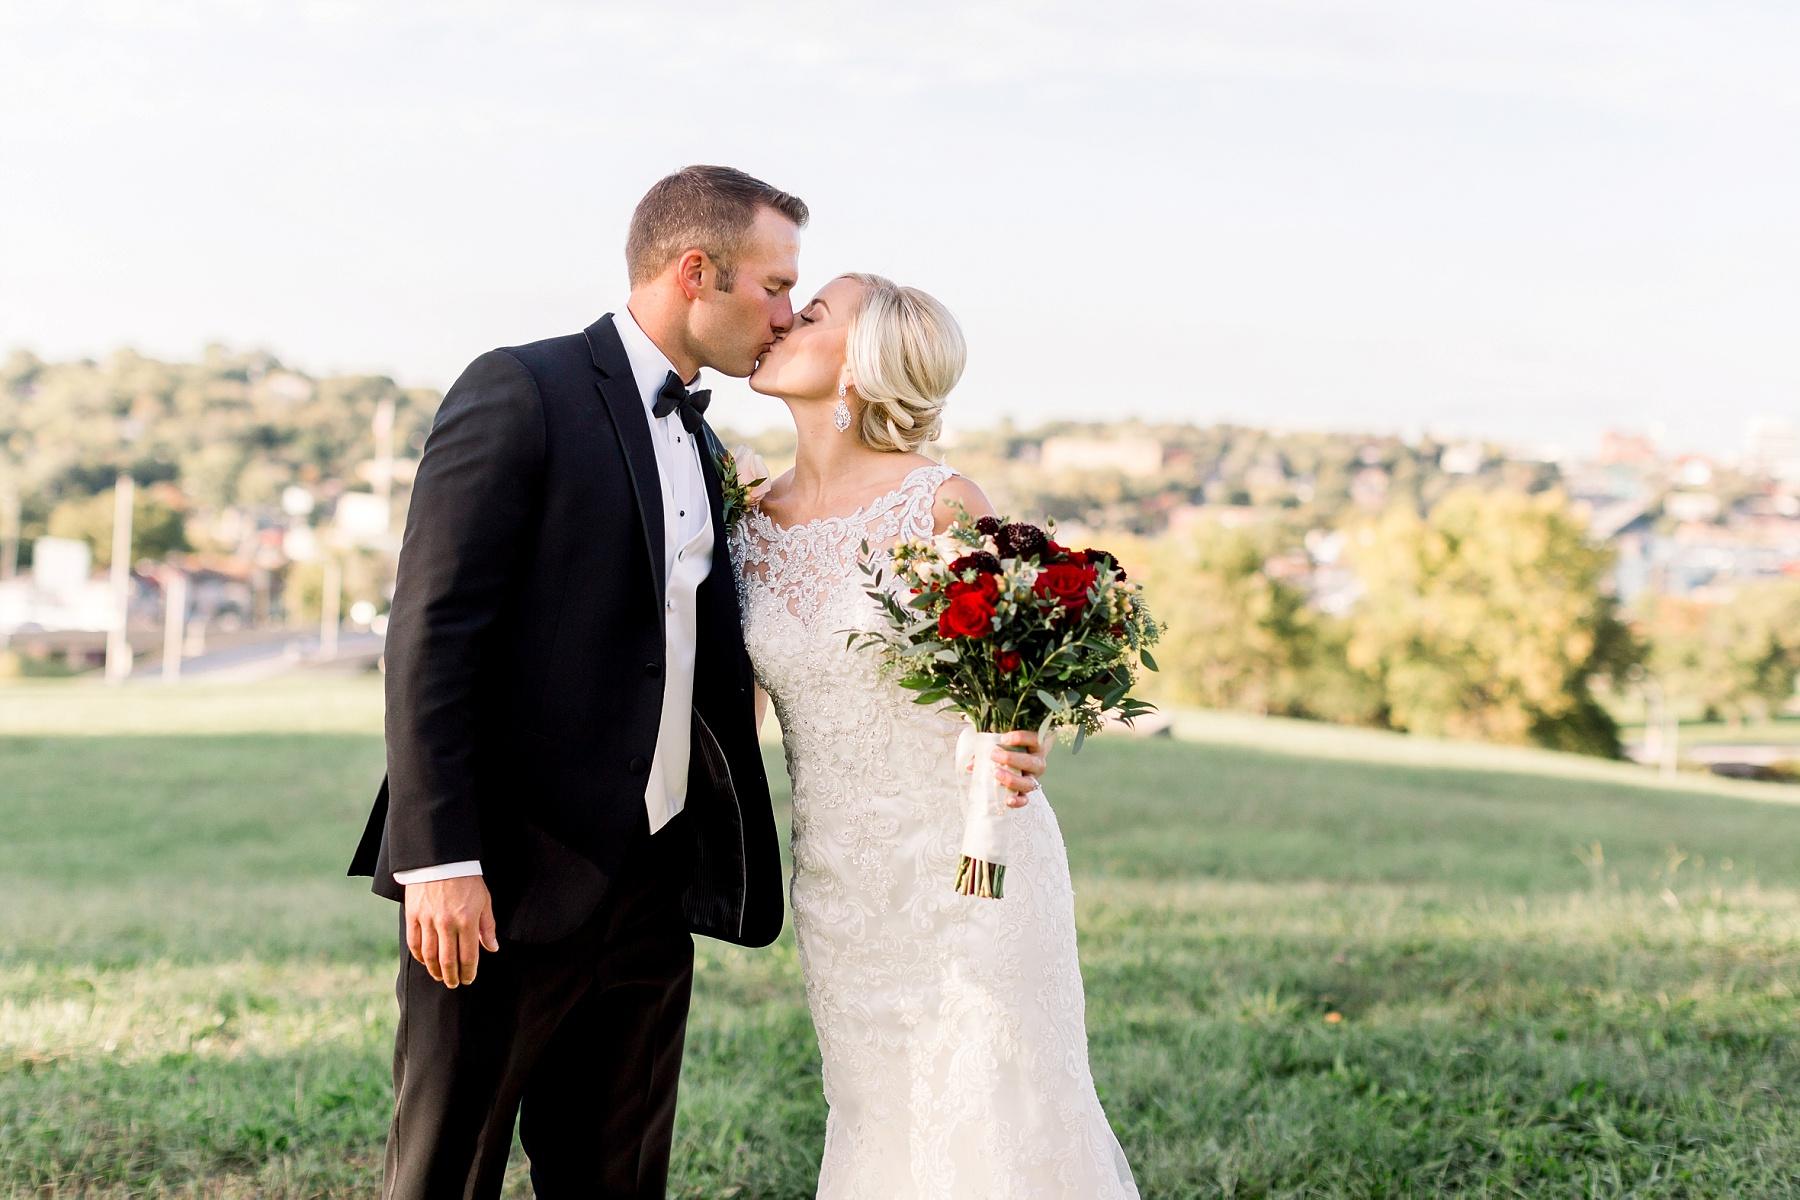 midwest-adventurous-wedding-photographer-elizabeth-ladean-photography-photo_4798.jpg